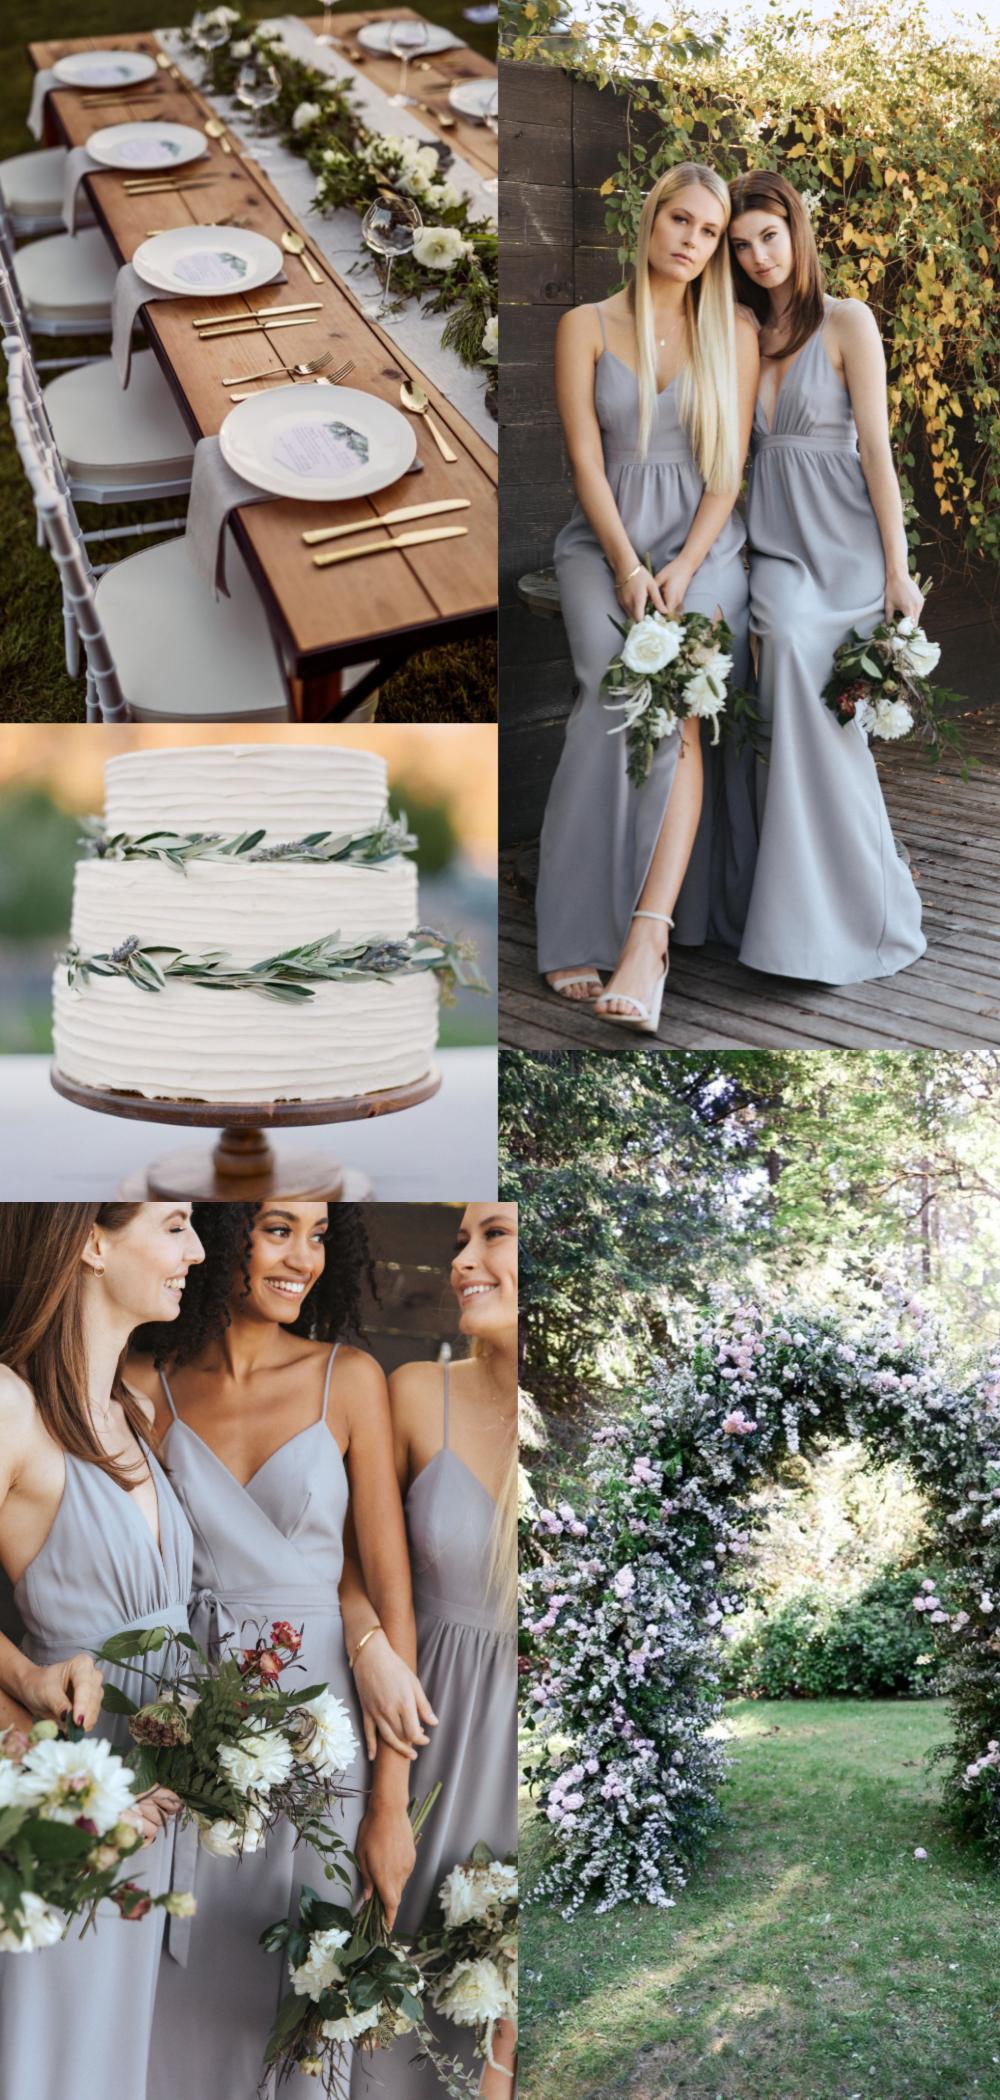 Park & Fifth Lavender Grey Bridesmaid Dresses Park & Fifth Lavender Grey Bridesmaid Dresses Bridesmaid Dresses lavender bridesmaid dresses